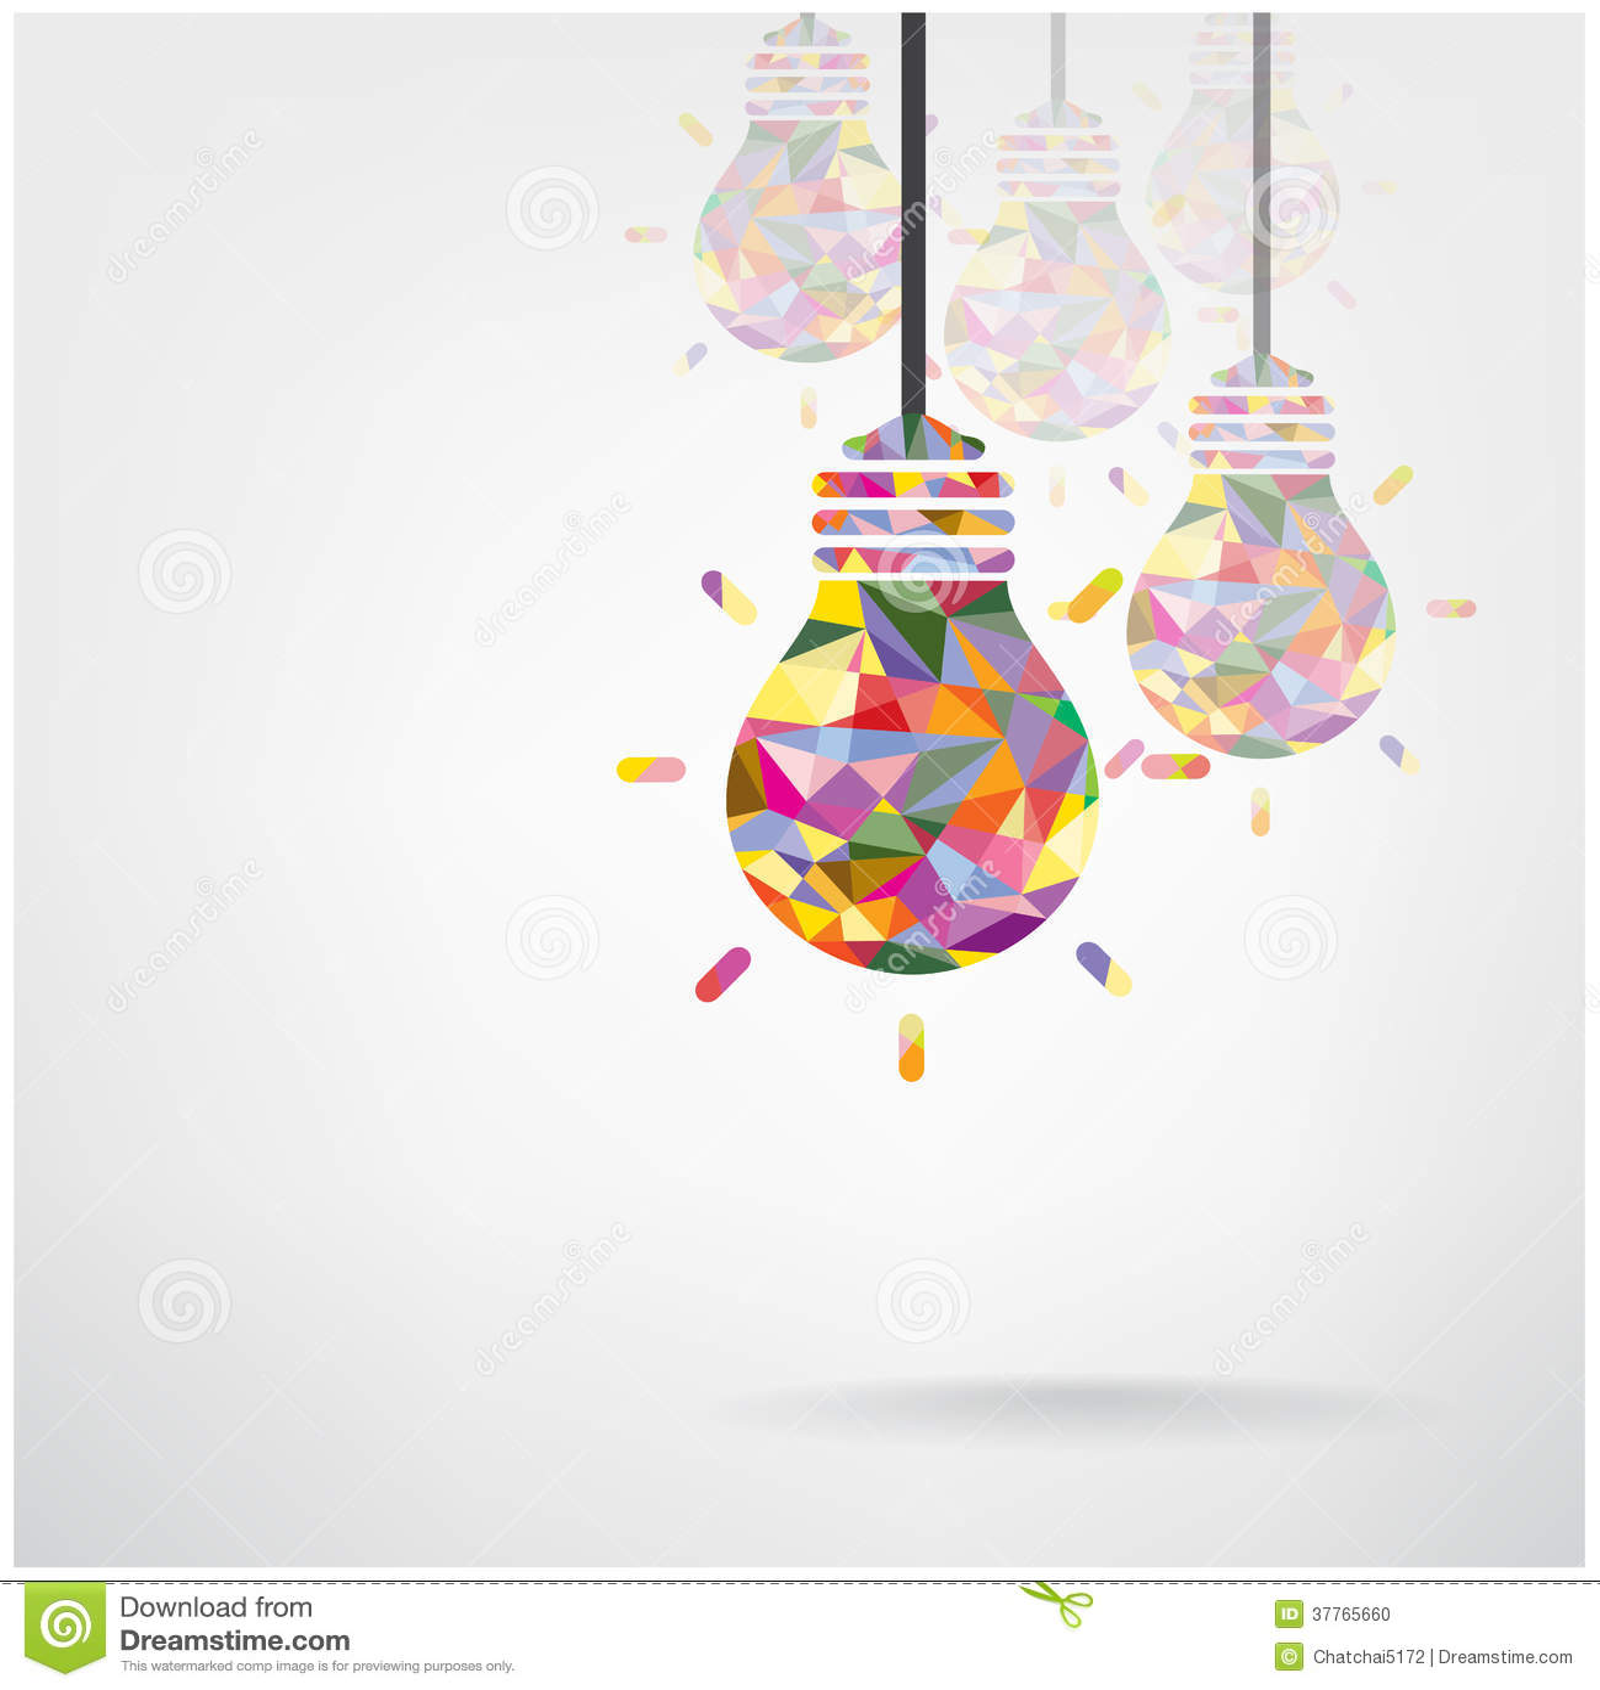 creative light bulb symbols stock vector image 37765660. Black Bedroom Furniture Sets. Home Design Ideas